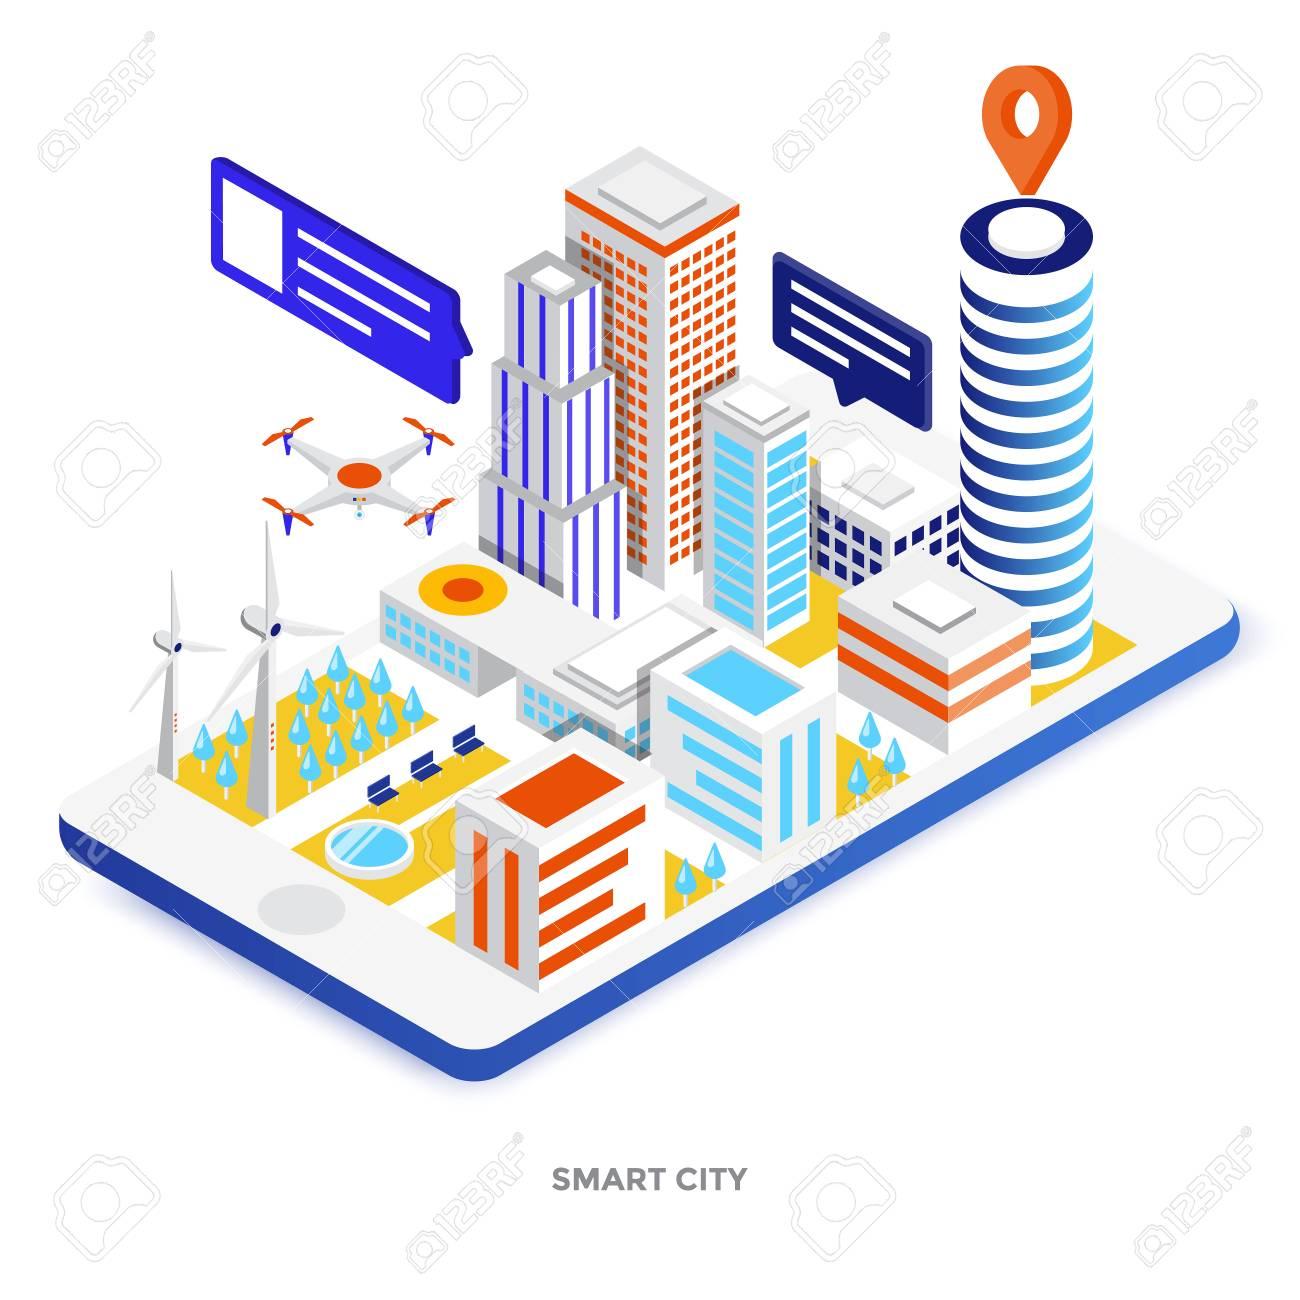 Modern flat design isometric illustration of Smart City  Can